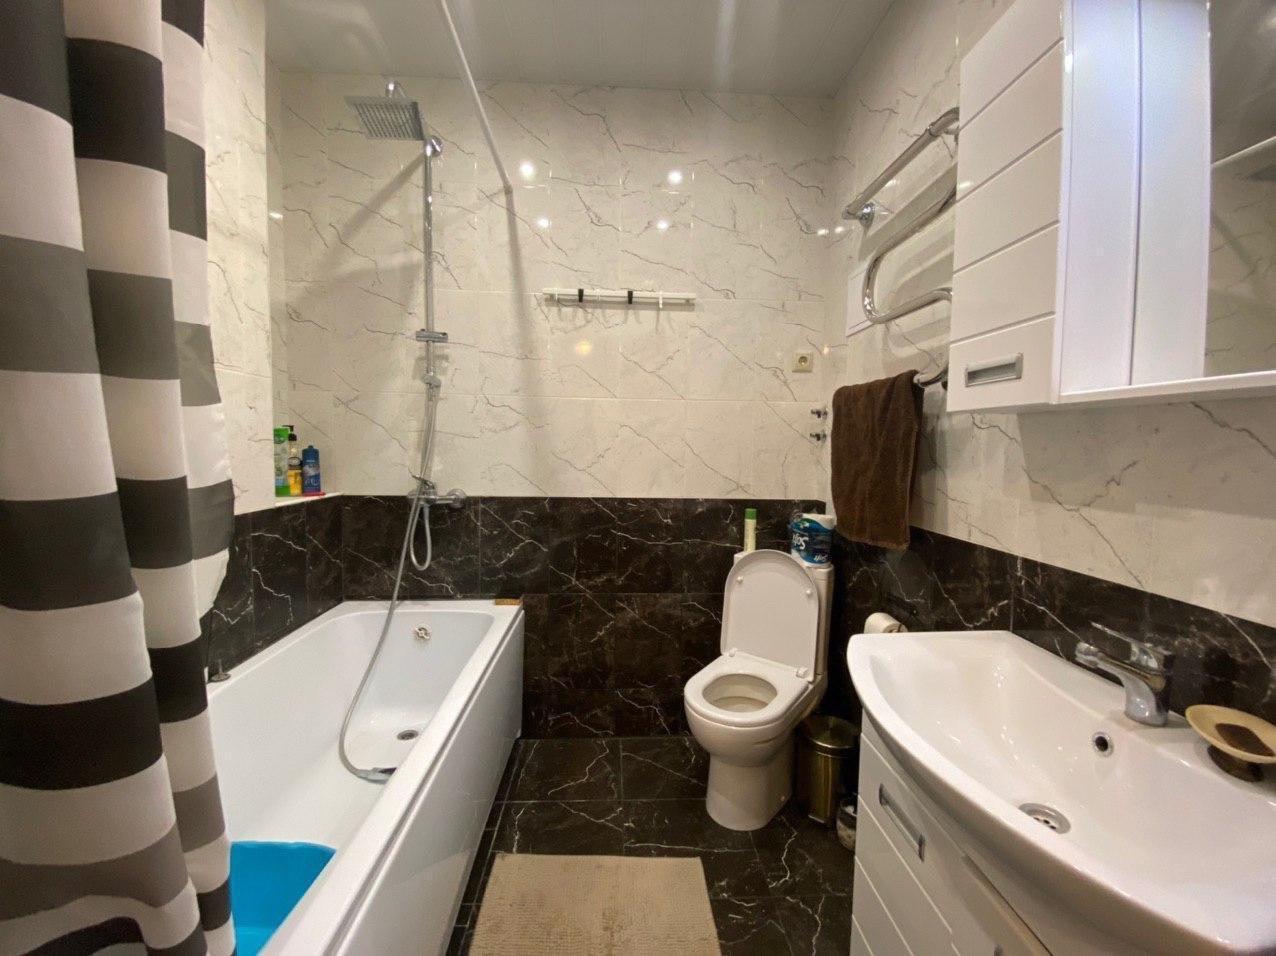 Квартира, 1 комната, 42 м² в Звенигороде 89999686698 купить 2